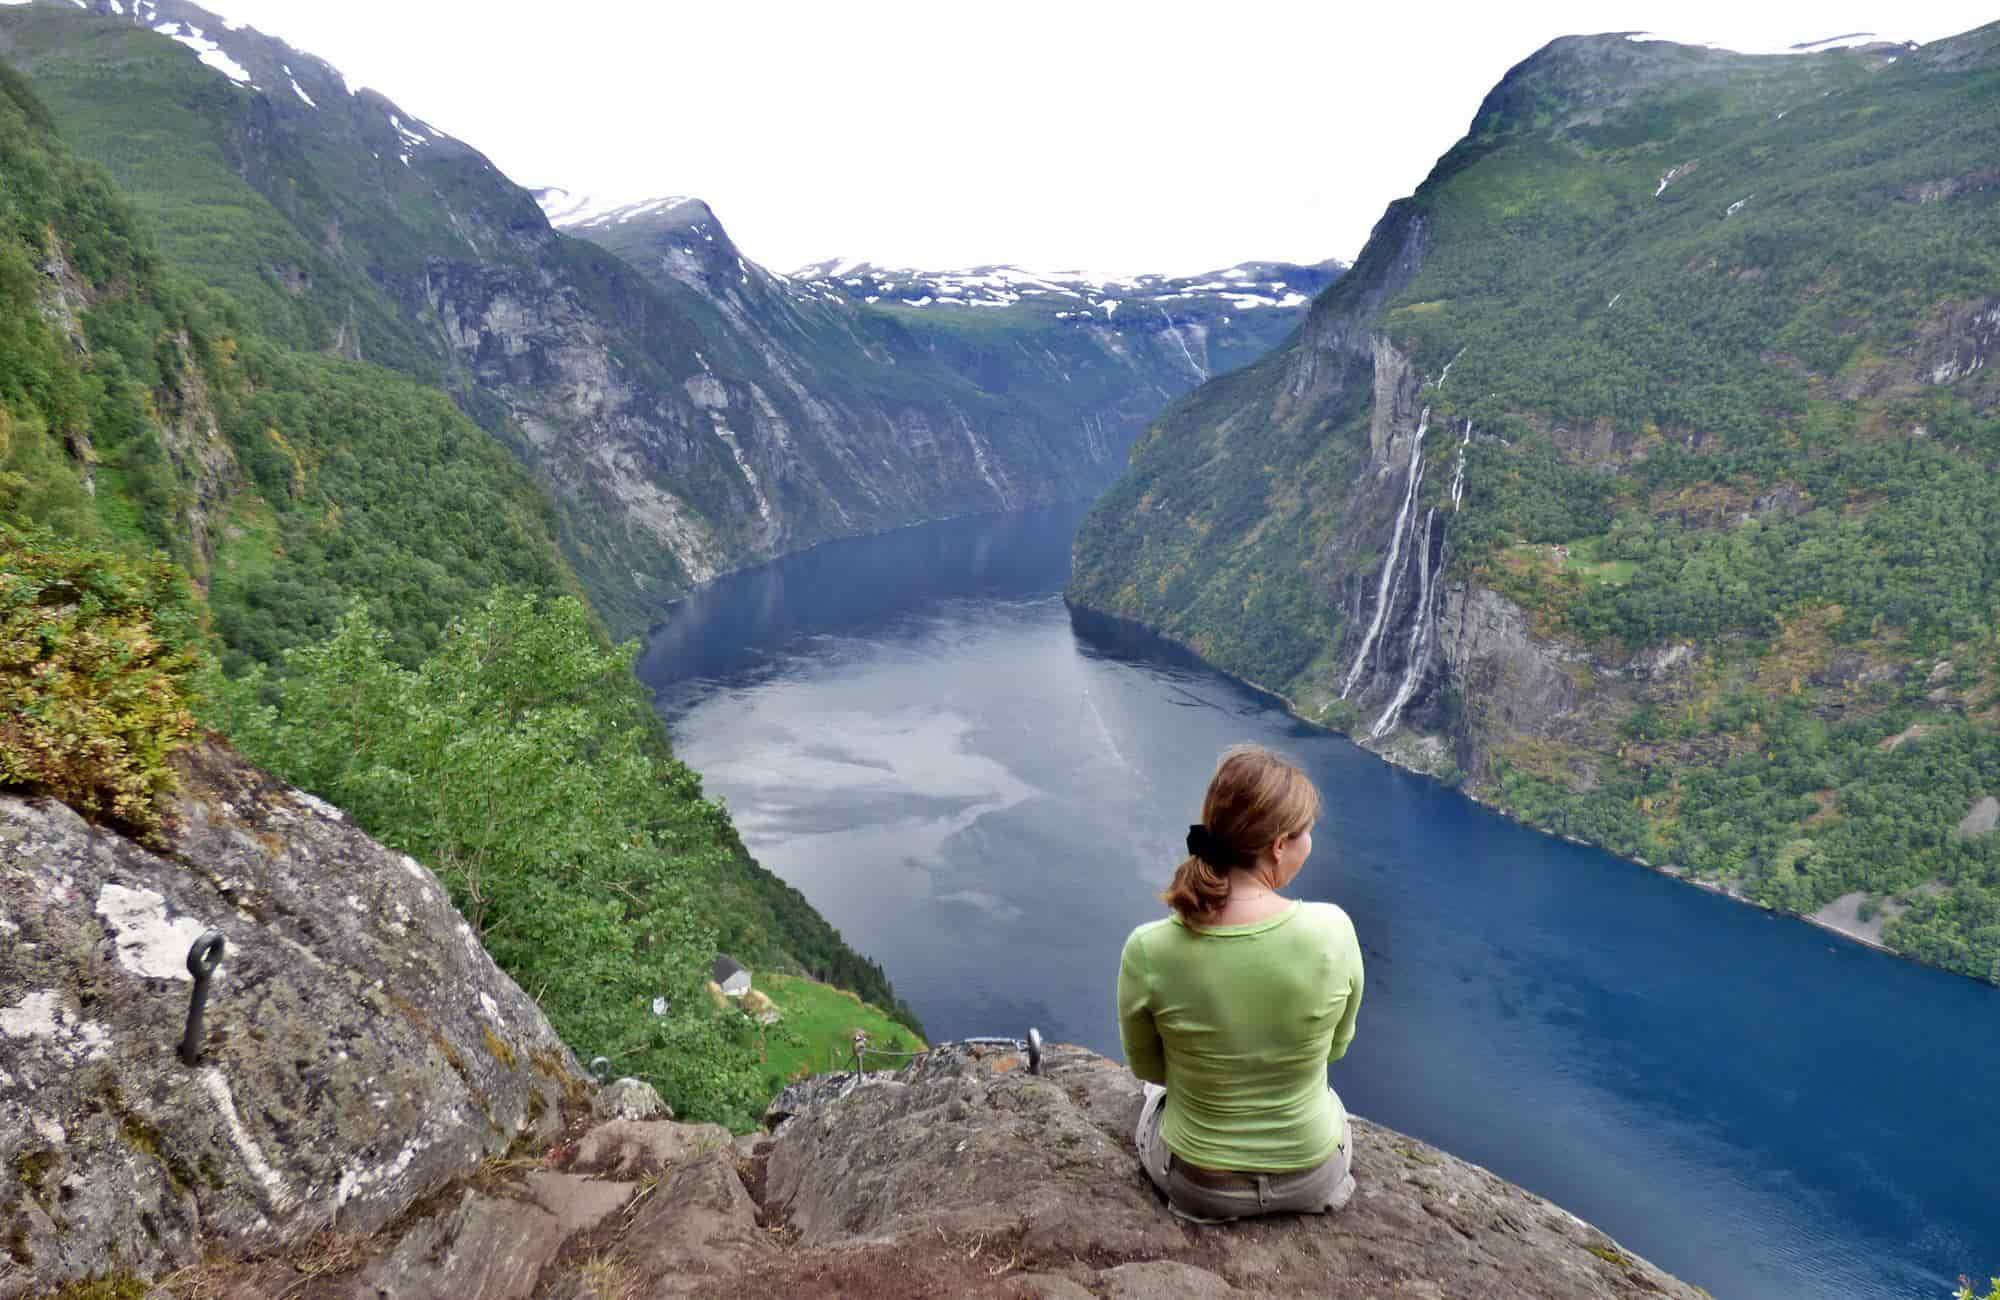 Voyage en Norvège - Geirangerfjord - Amplitudes